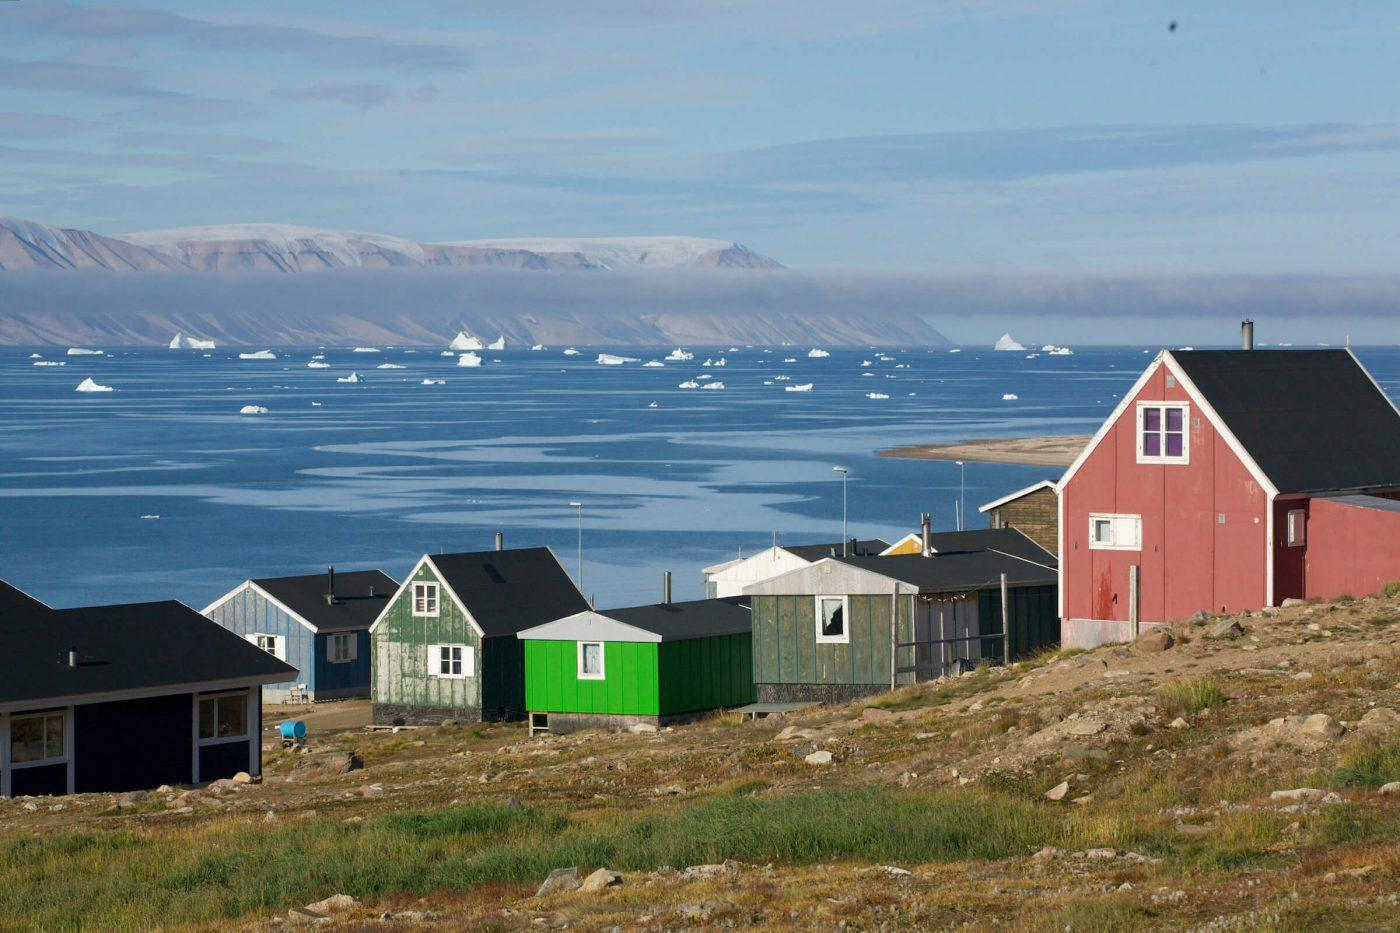 Qaanaaq, with view over the sea towards Herbert Island. Photo by Glenn Mattsing.